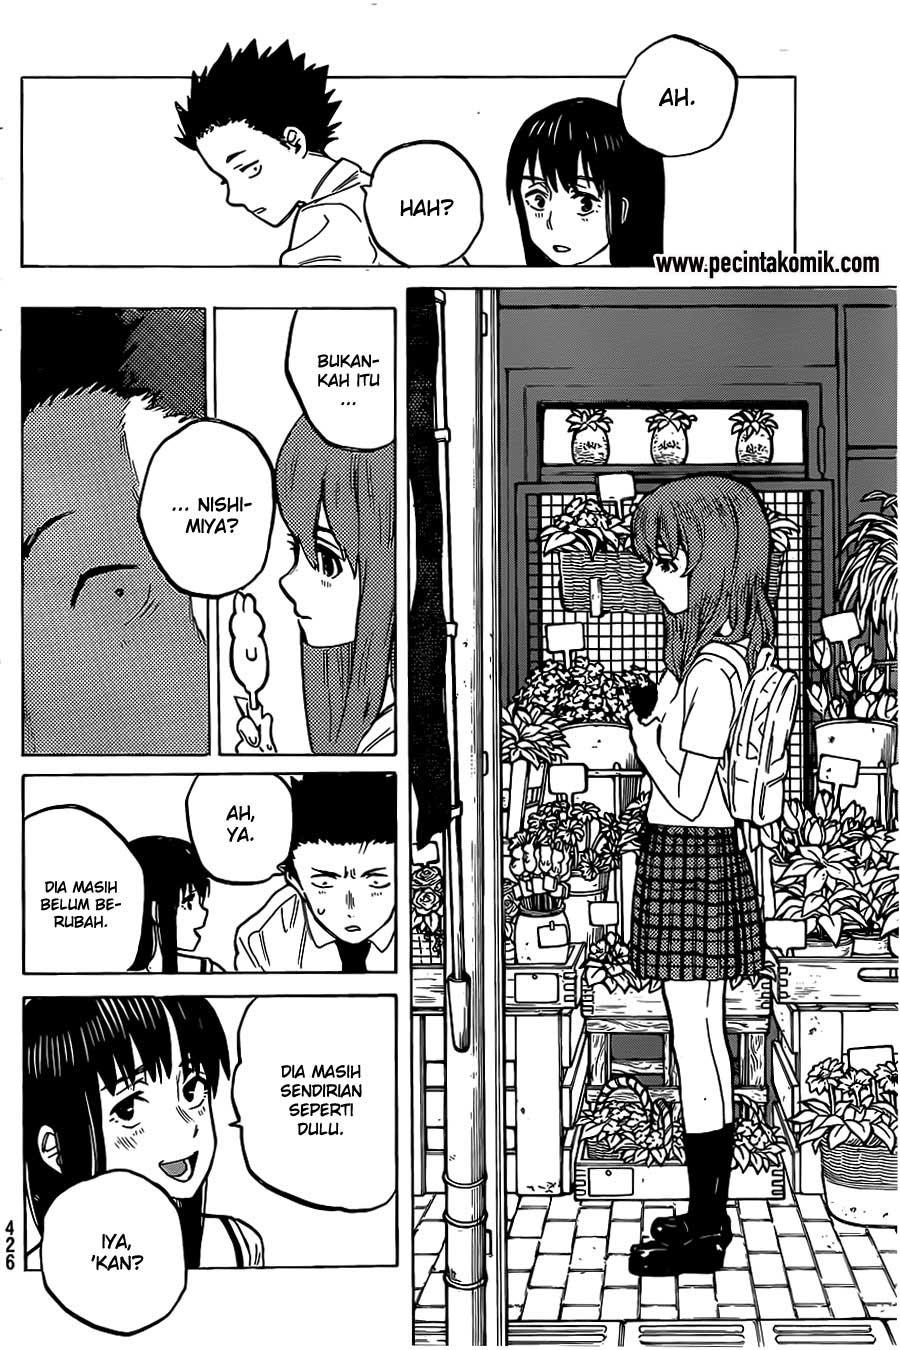 Koe no Katachi Chapter 20-19